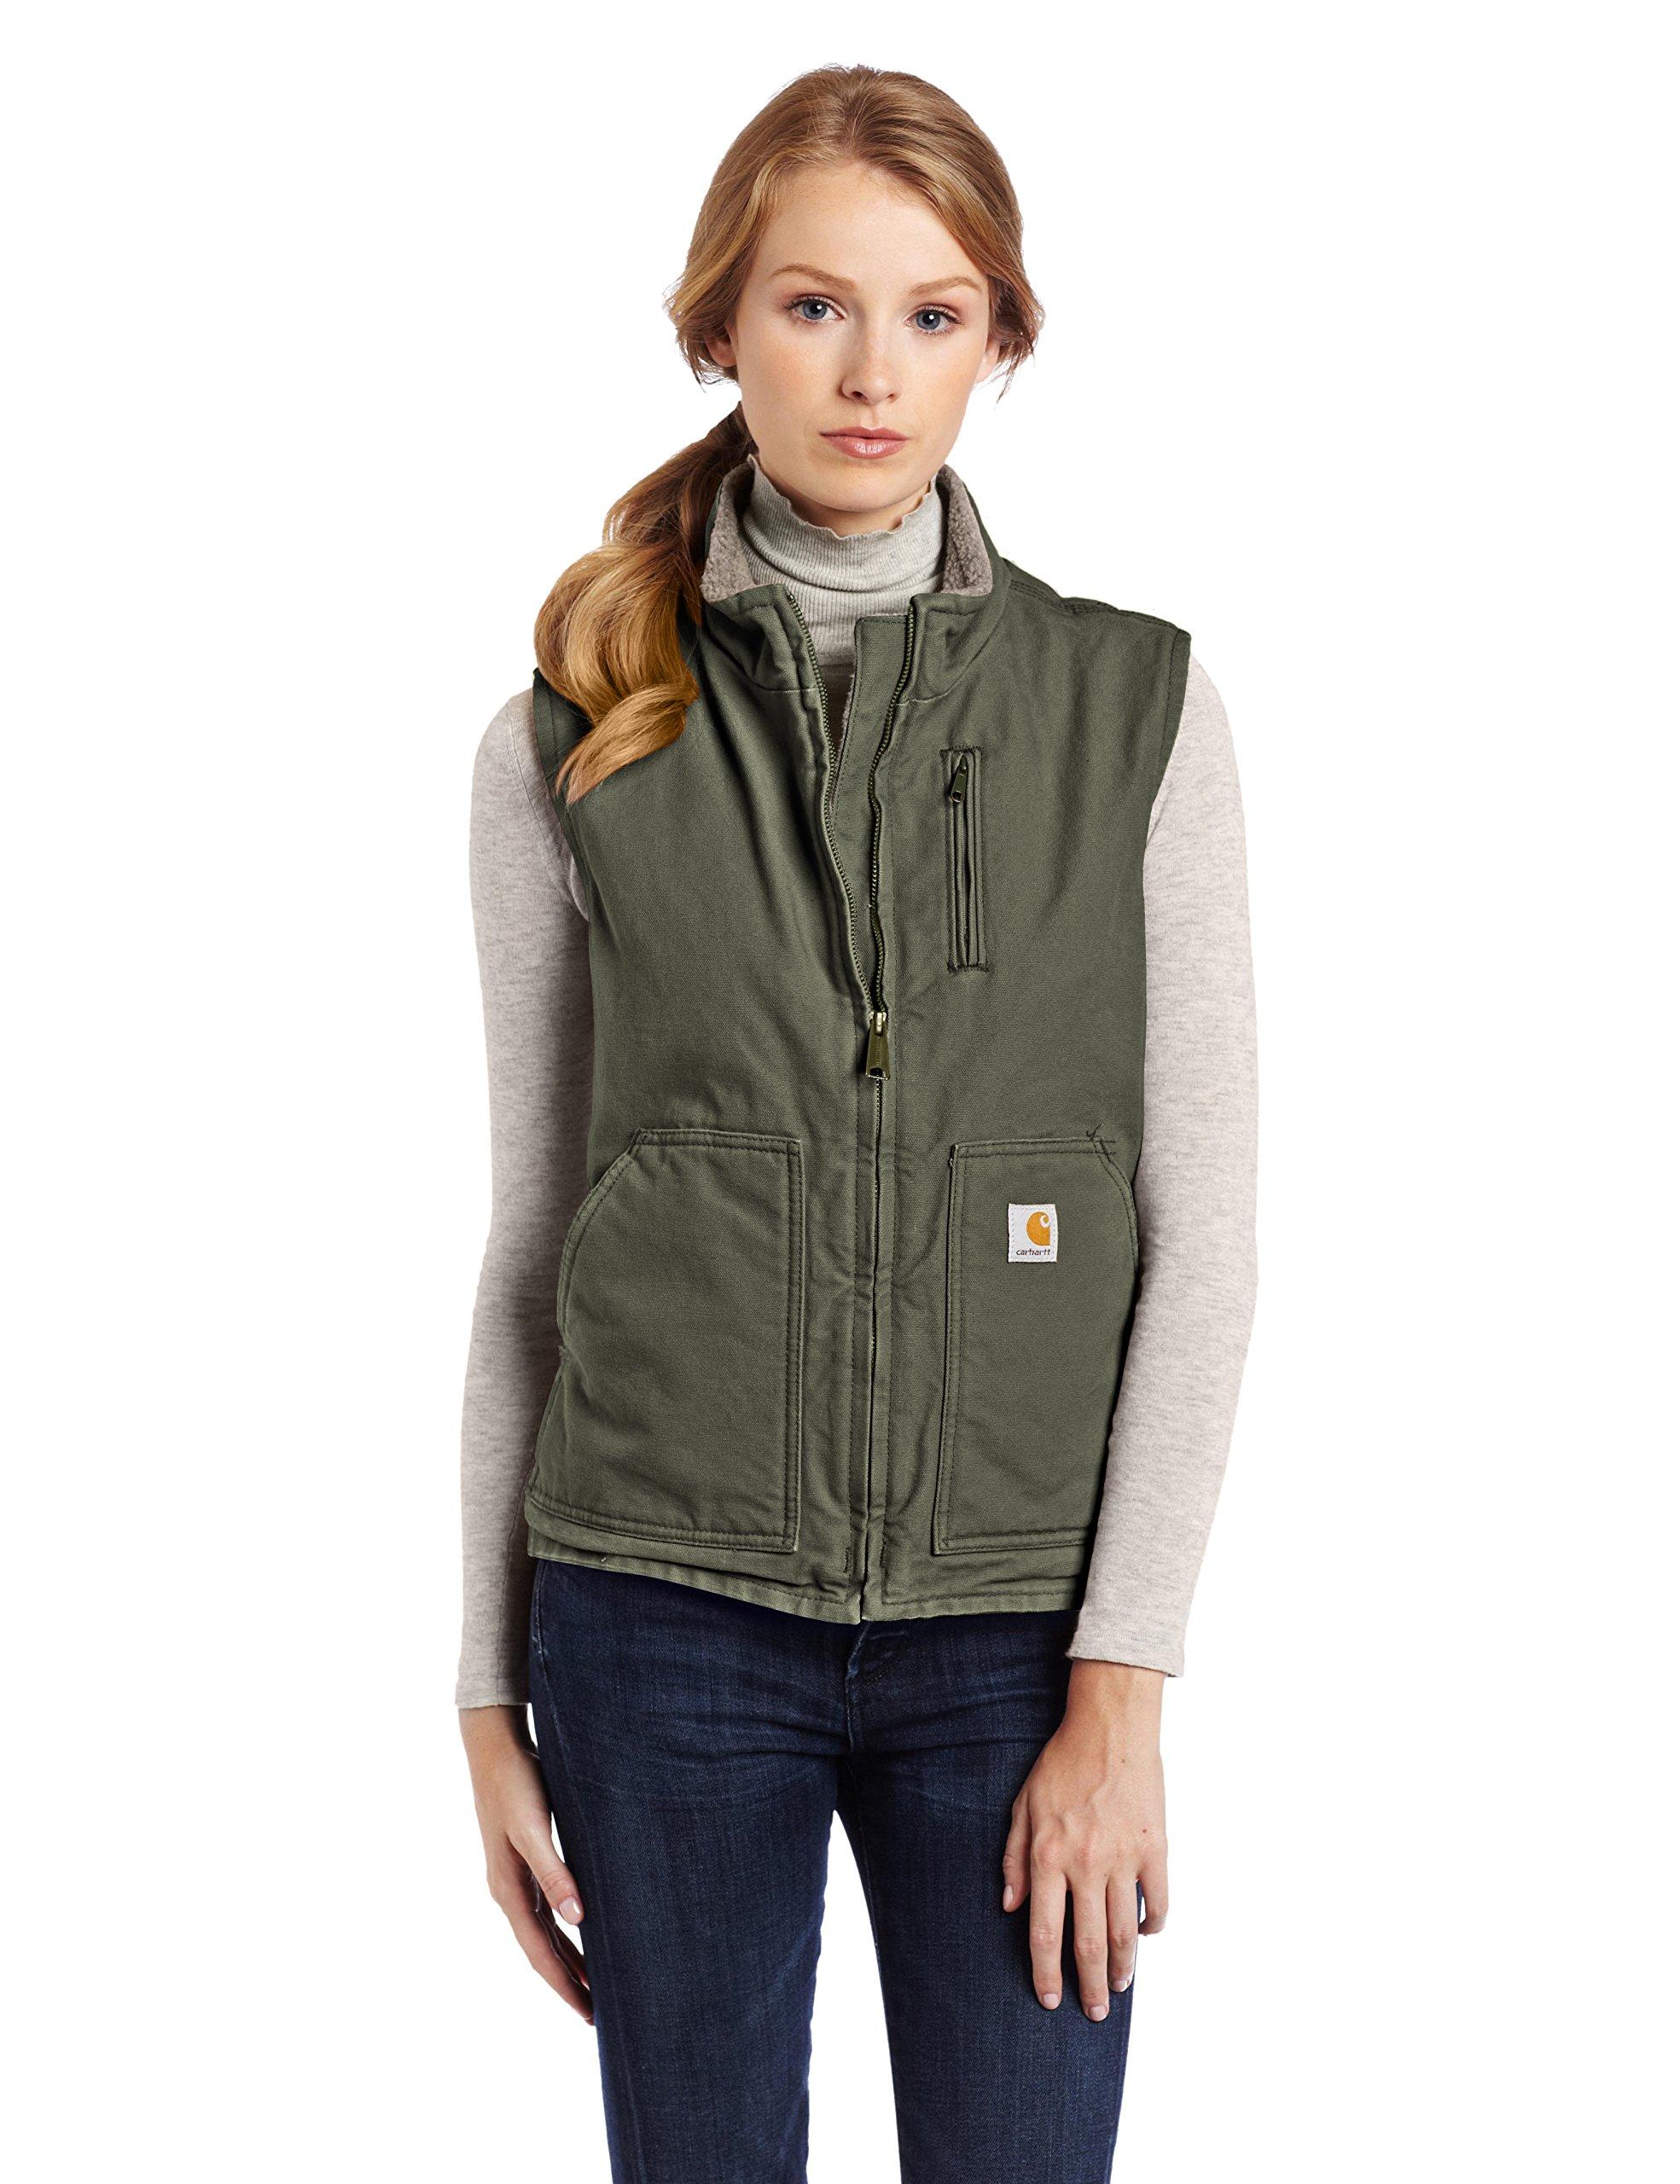 Carhartt Women's Sandstone Mock Neck Vest Sherpa Lined Zip Front, Woodland, X-Small